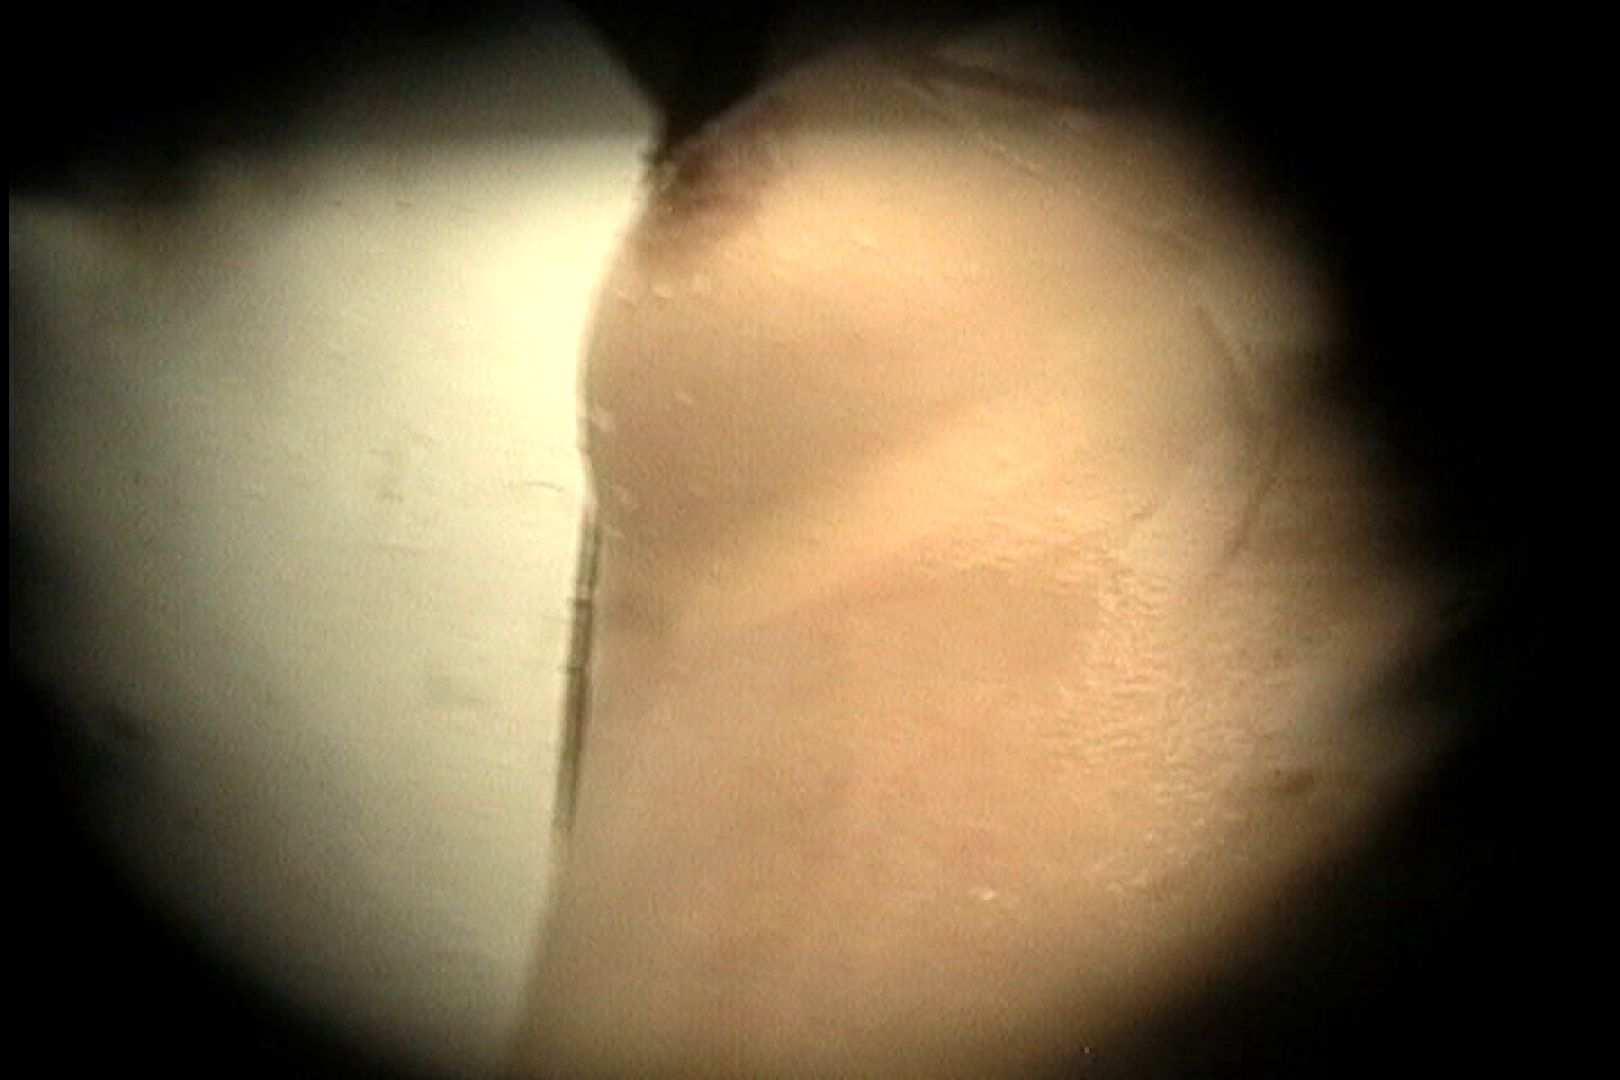 No.45 綺麗なお女市さん!さすがのテクニック!! シャワー 覗きワレメ動画紹介 104pic 54